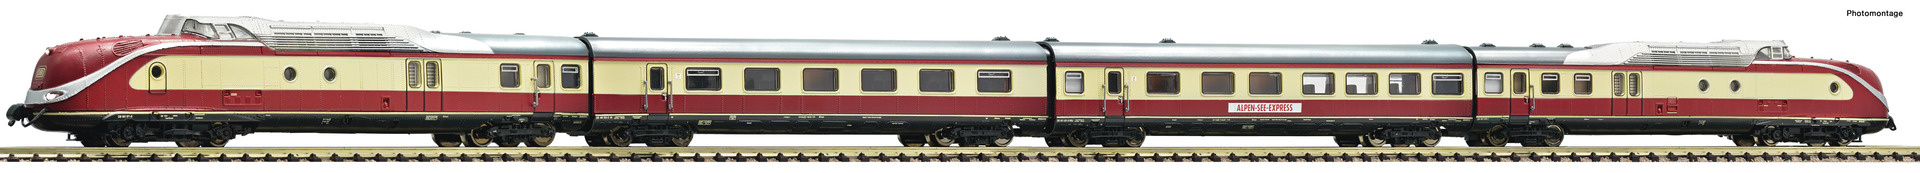 741005 D-Triebzug BR601 DB-1